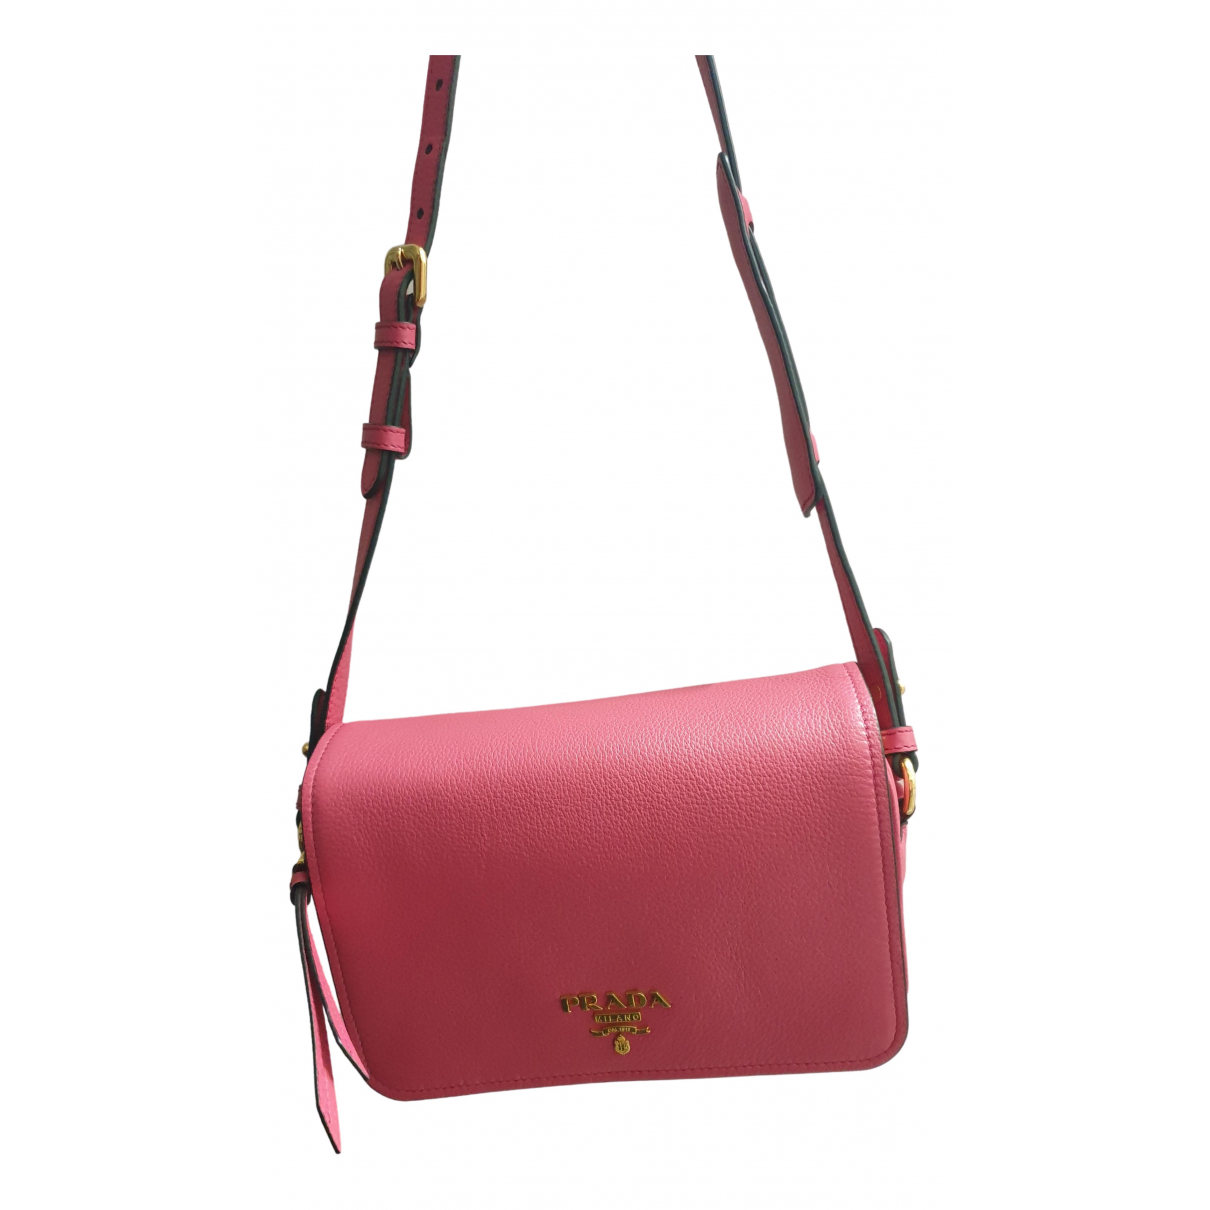 Prada N Pink Leather handbag for Women N